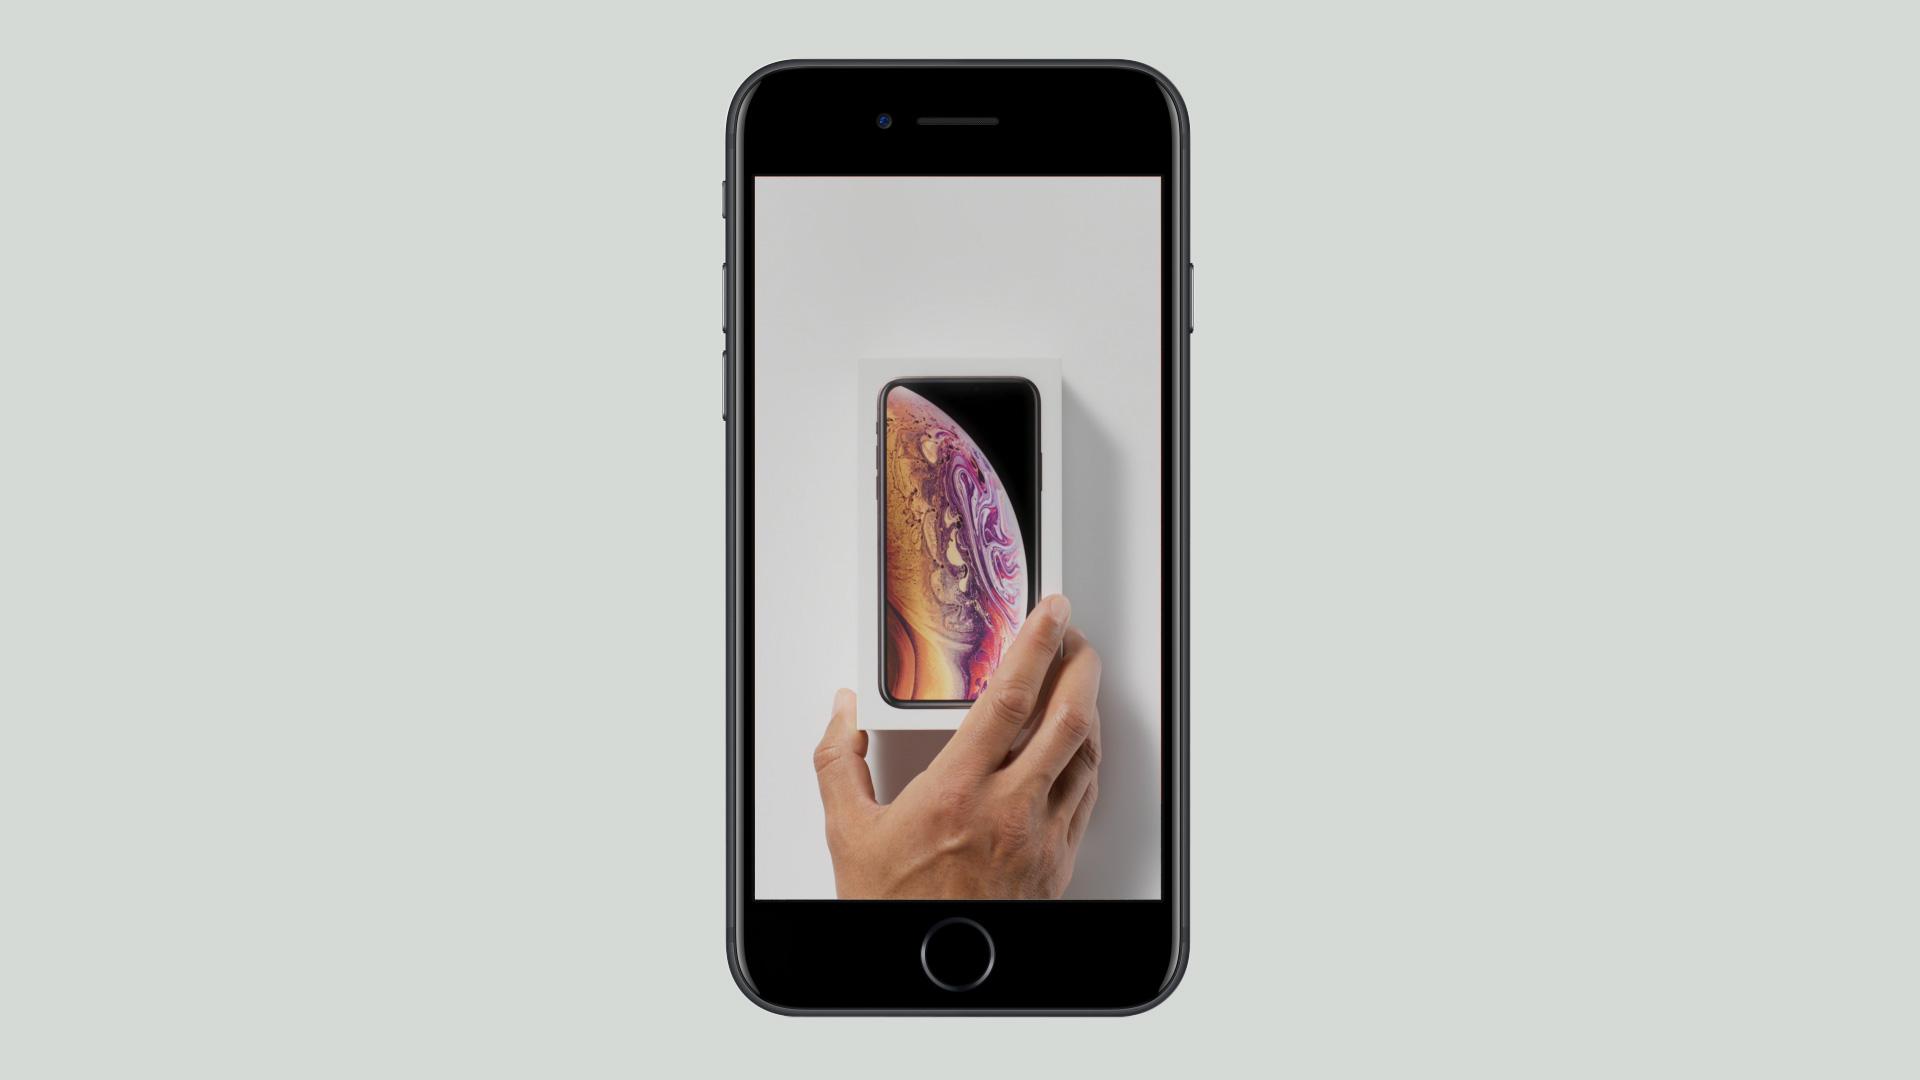 iphone_portrait_device_overlay_00159.jpg